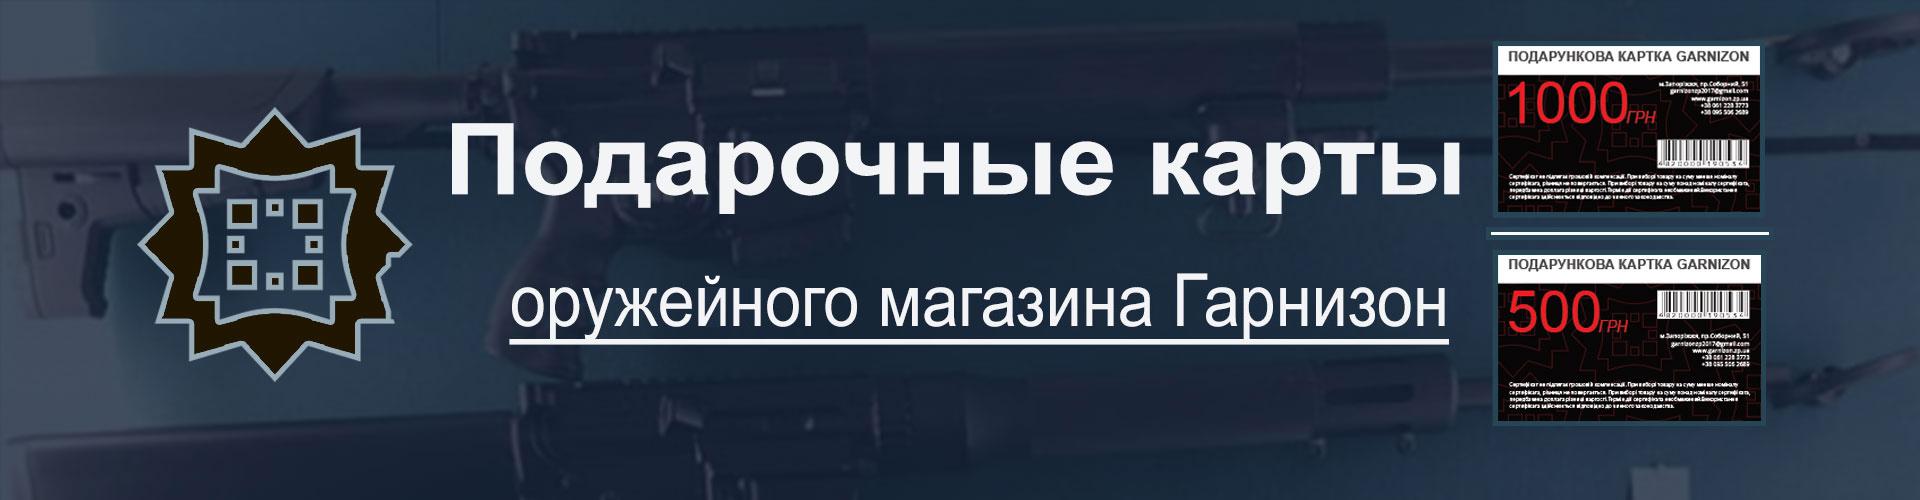 4918179-1568889162